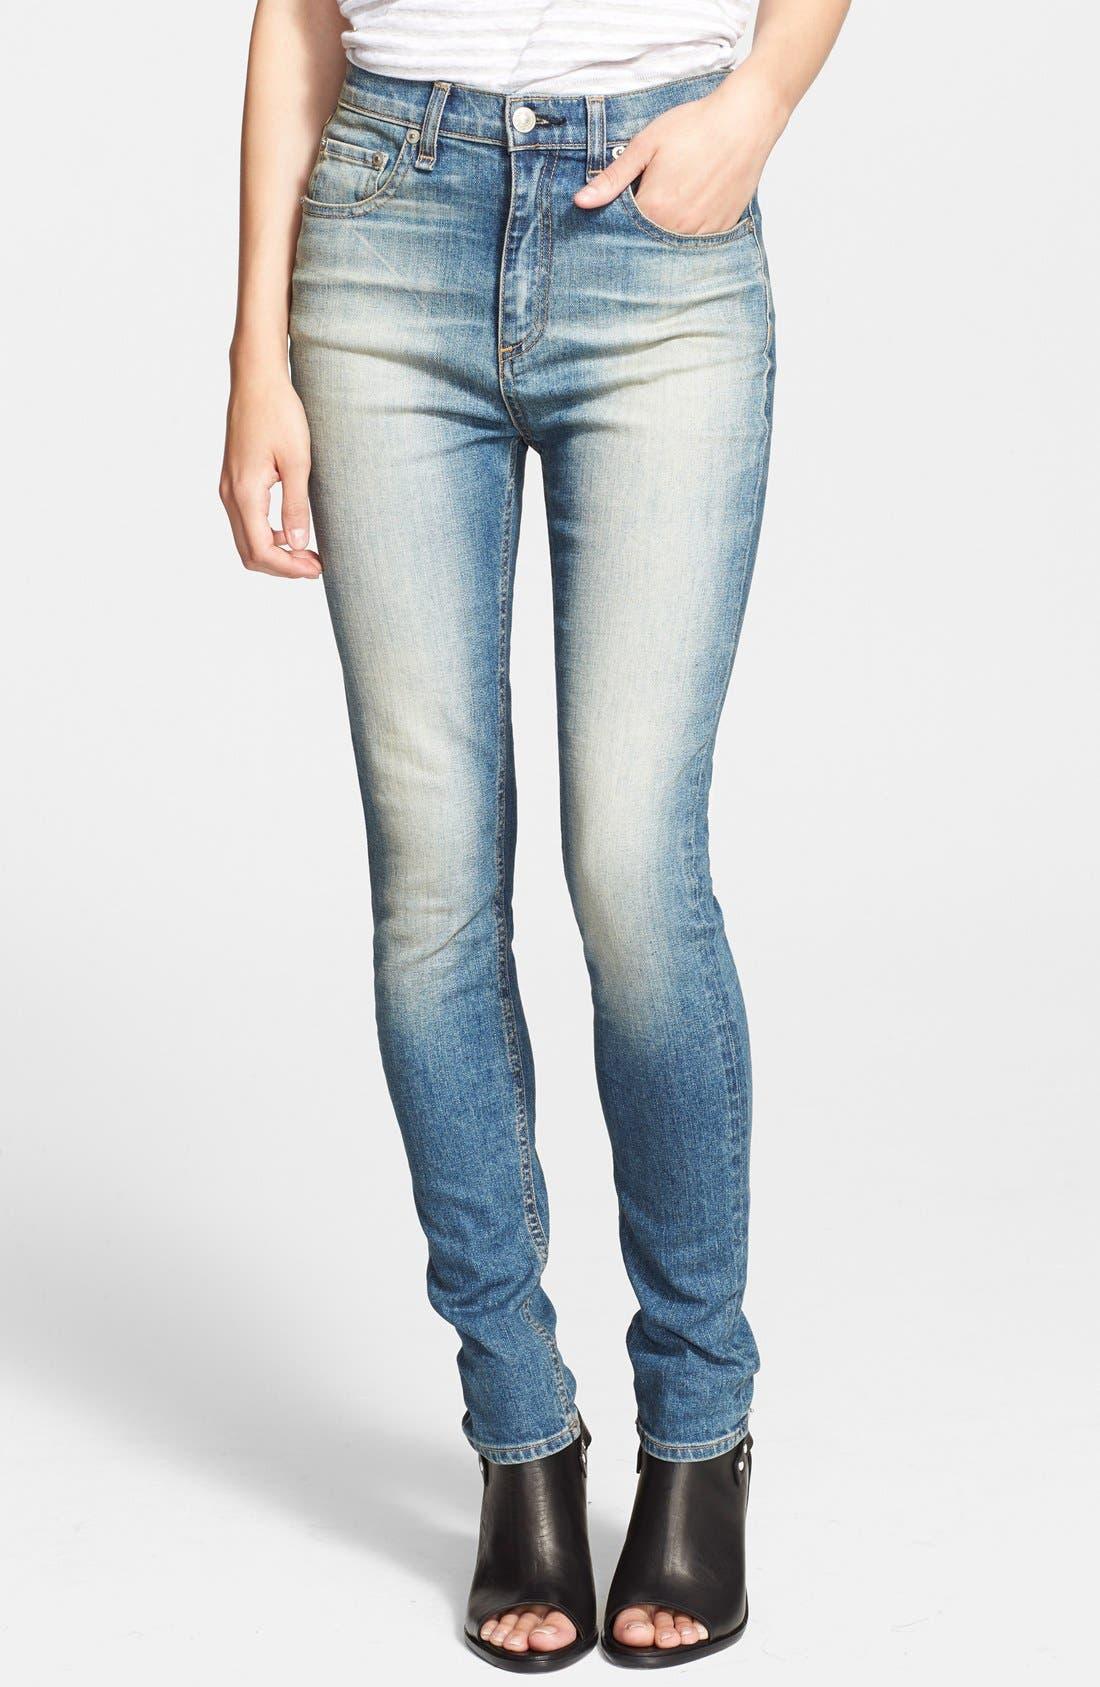 Alternate Image 1 Selected - rag & bone/JEAN 'The Justine' High Rise Jeans (Surf)